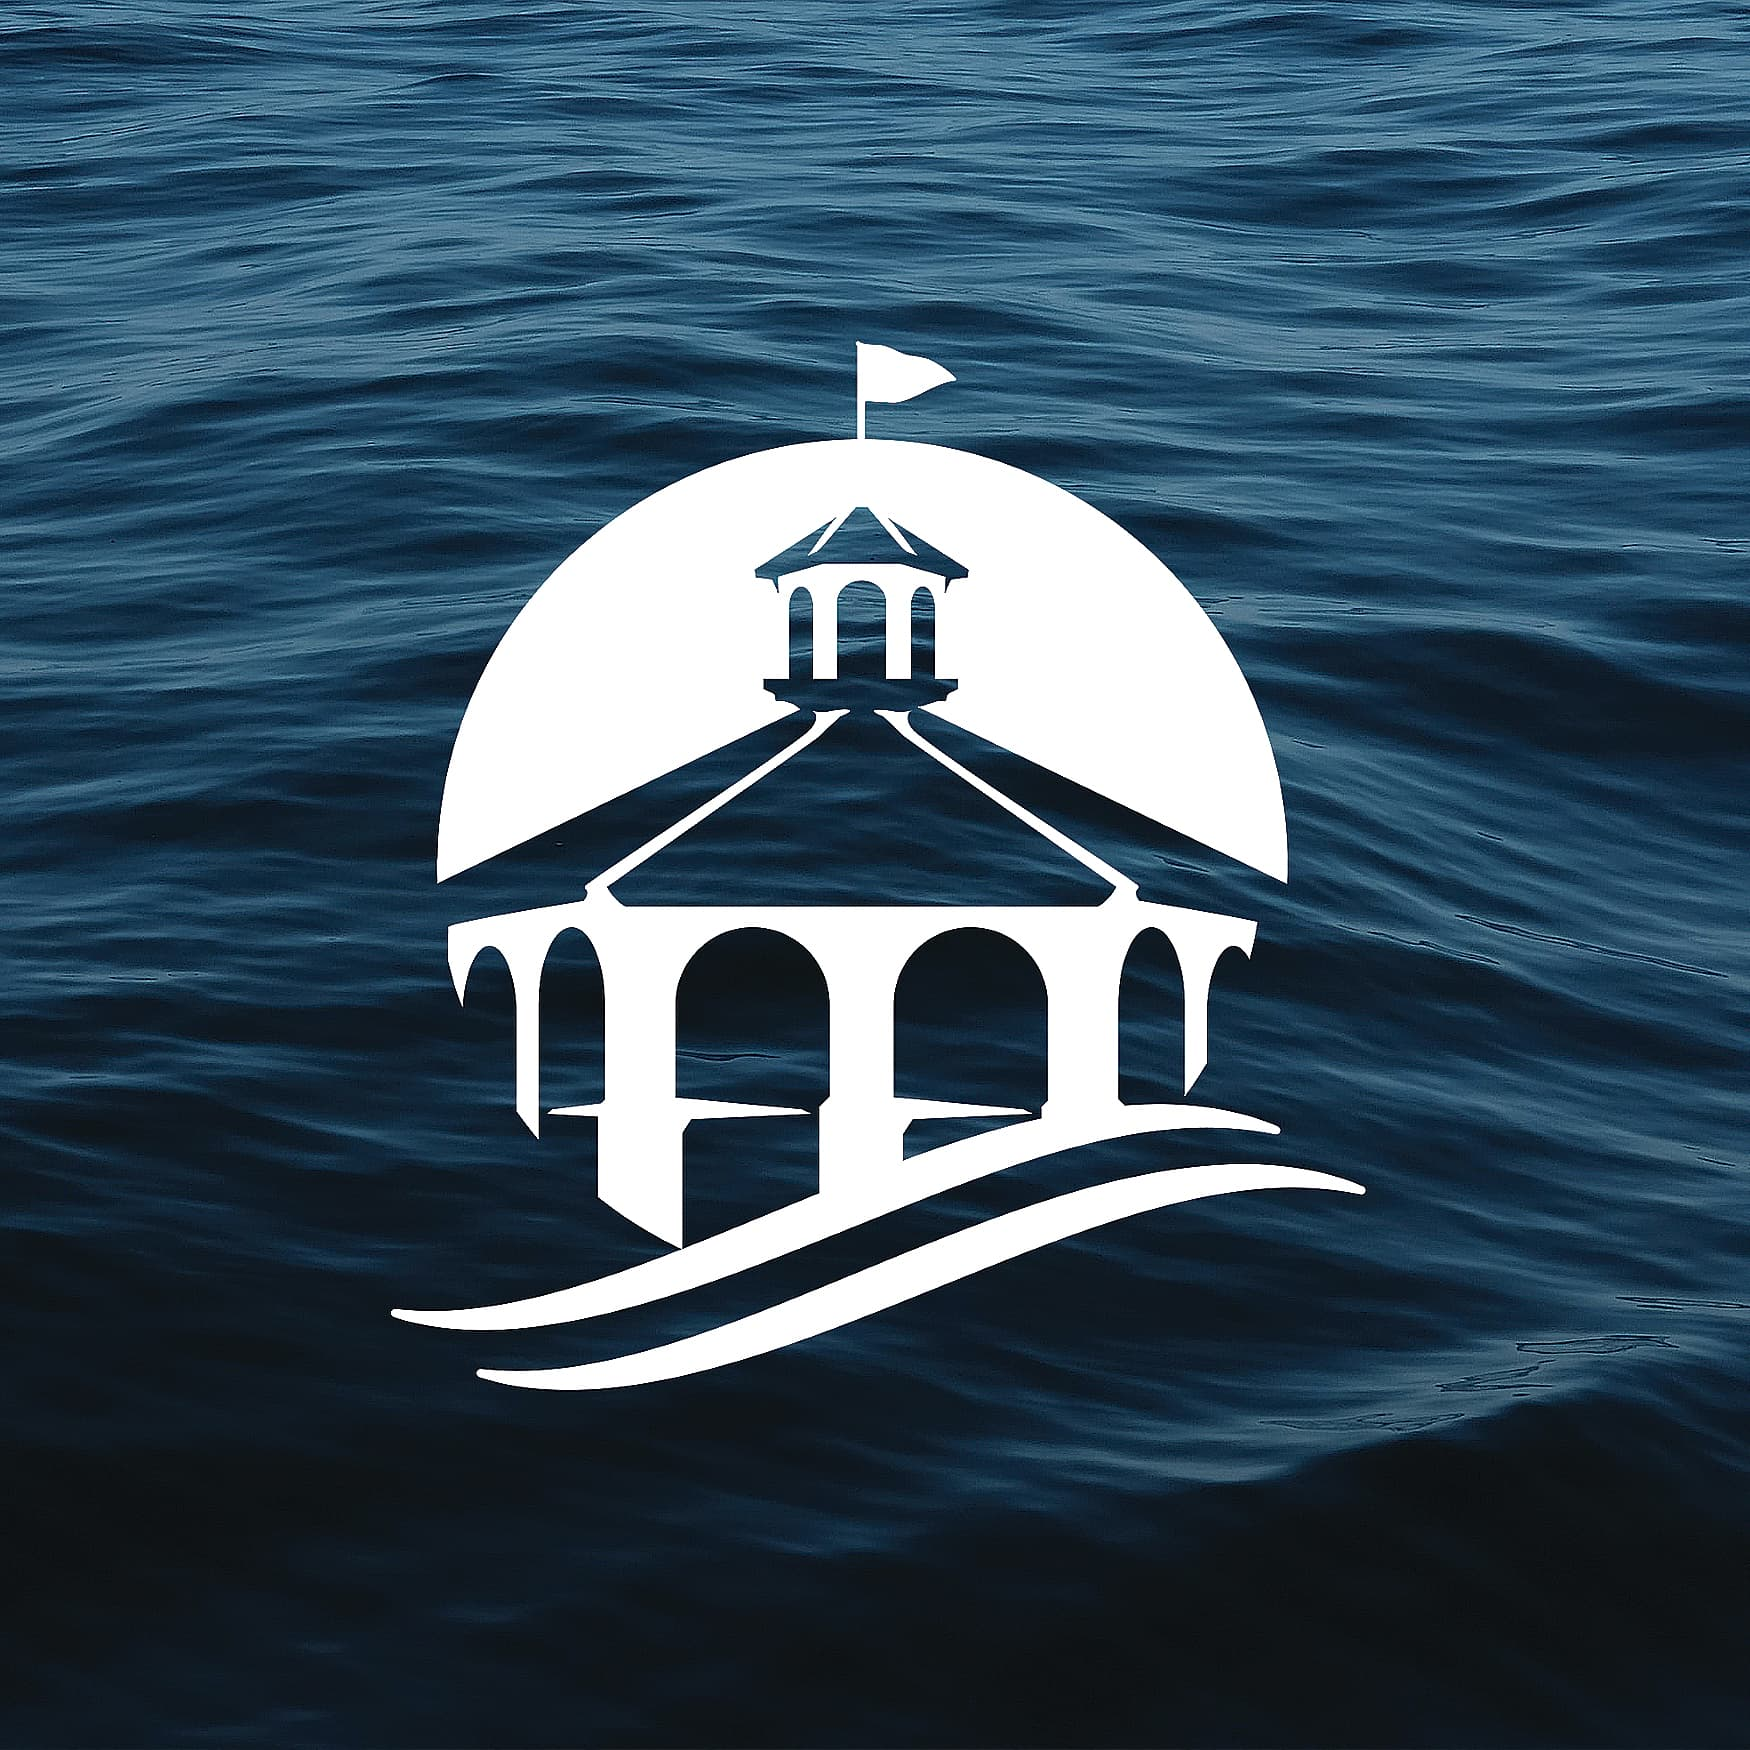 Logo design for Seaport Village over an image of ocean waves.